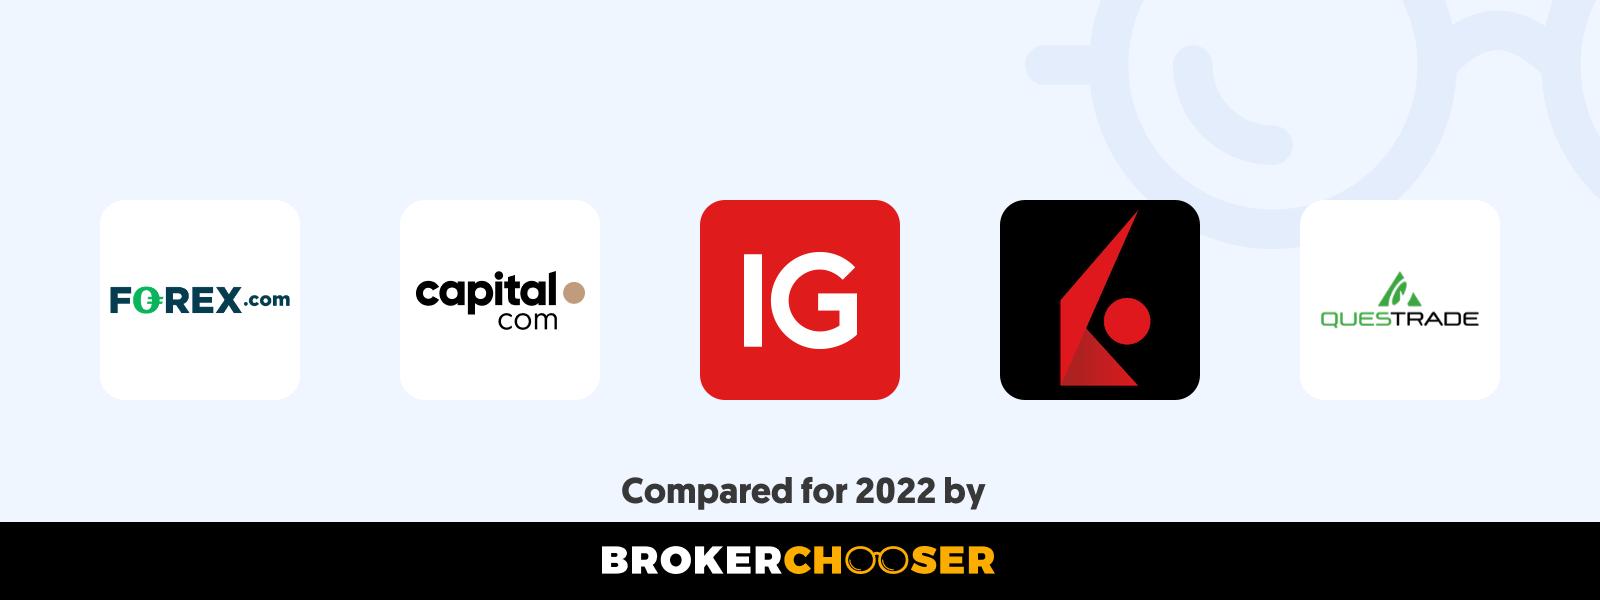 Best forex brokers for beginners in Laos in 2021